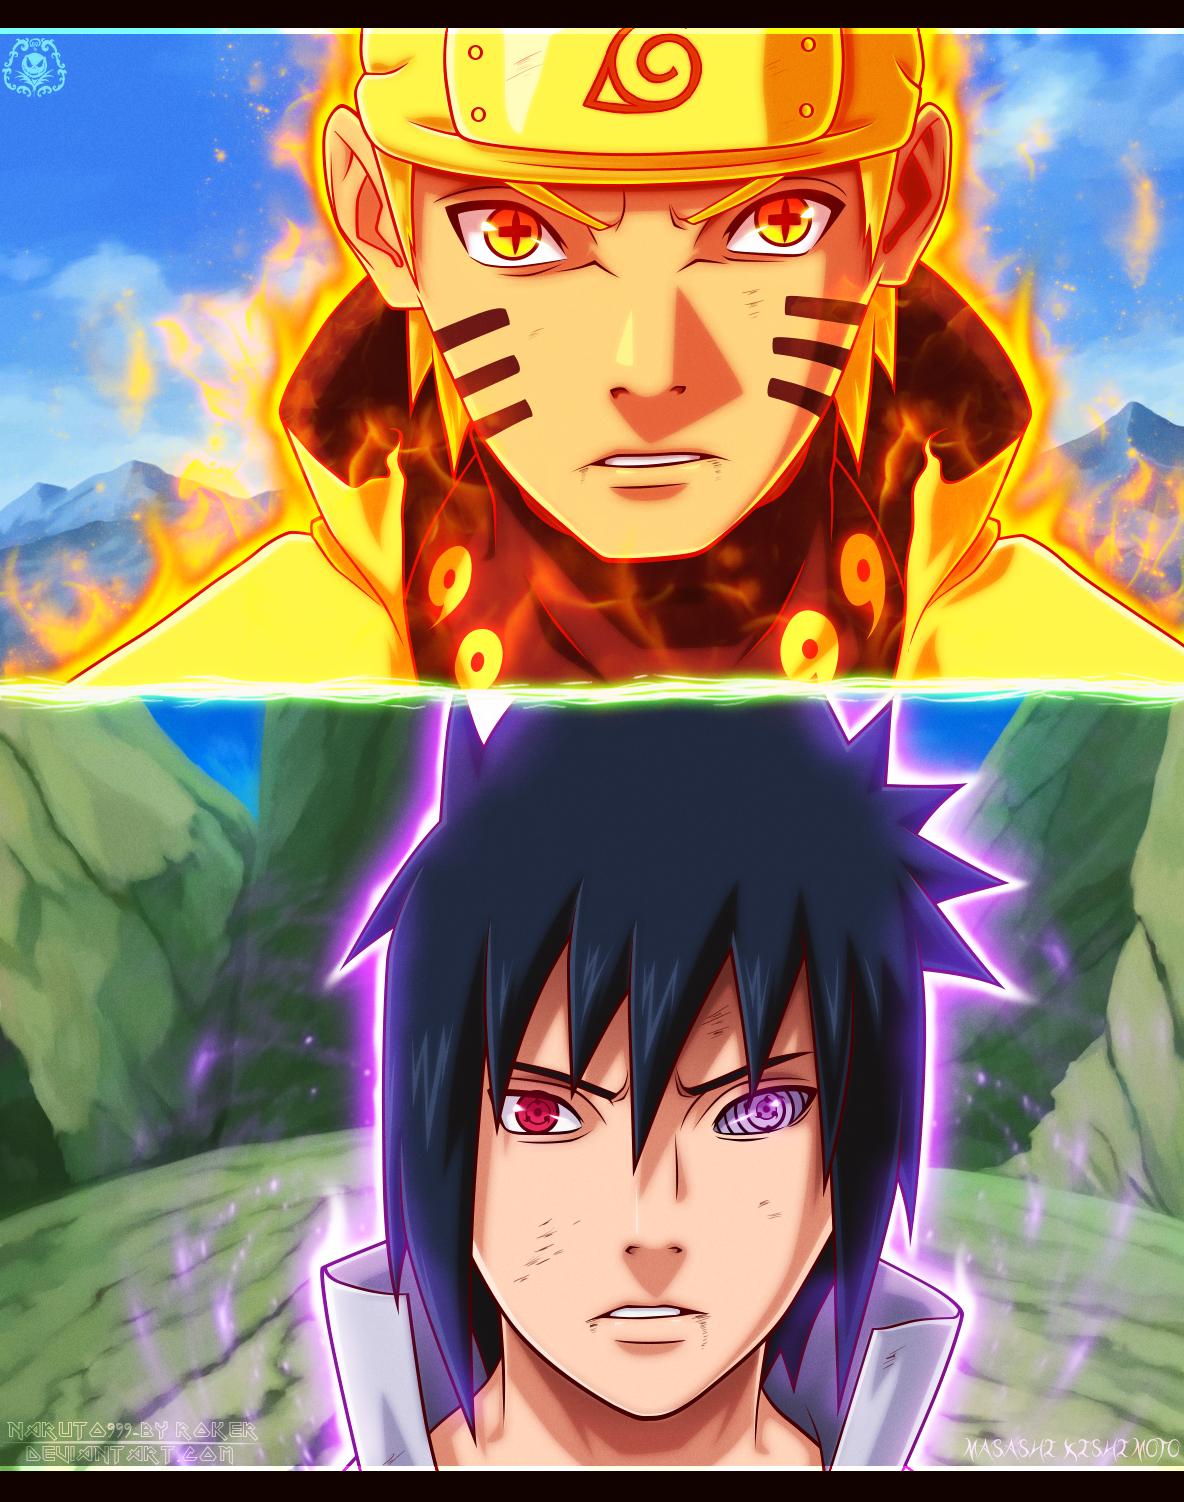 Naruto vs Sasuke final fight by The-103 on DeviantArt